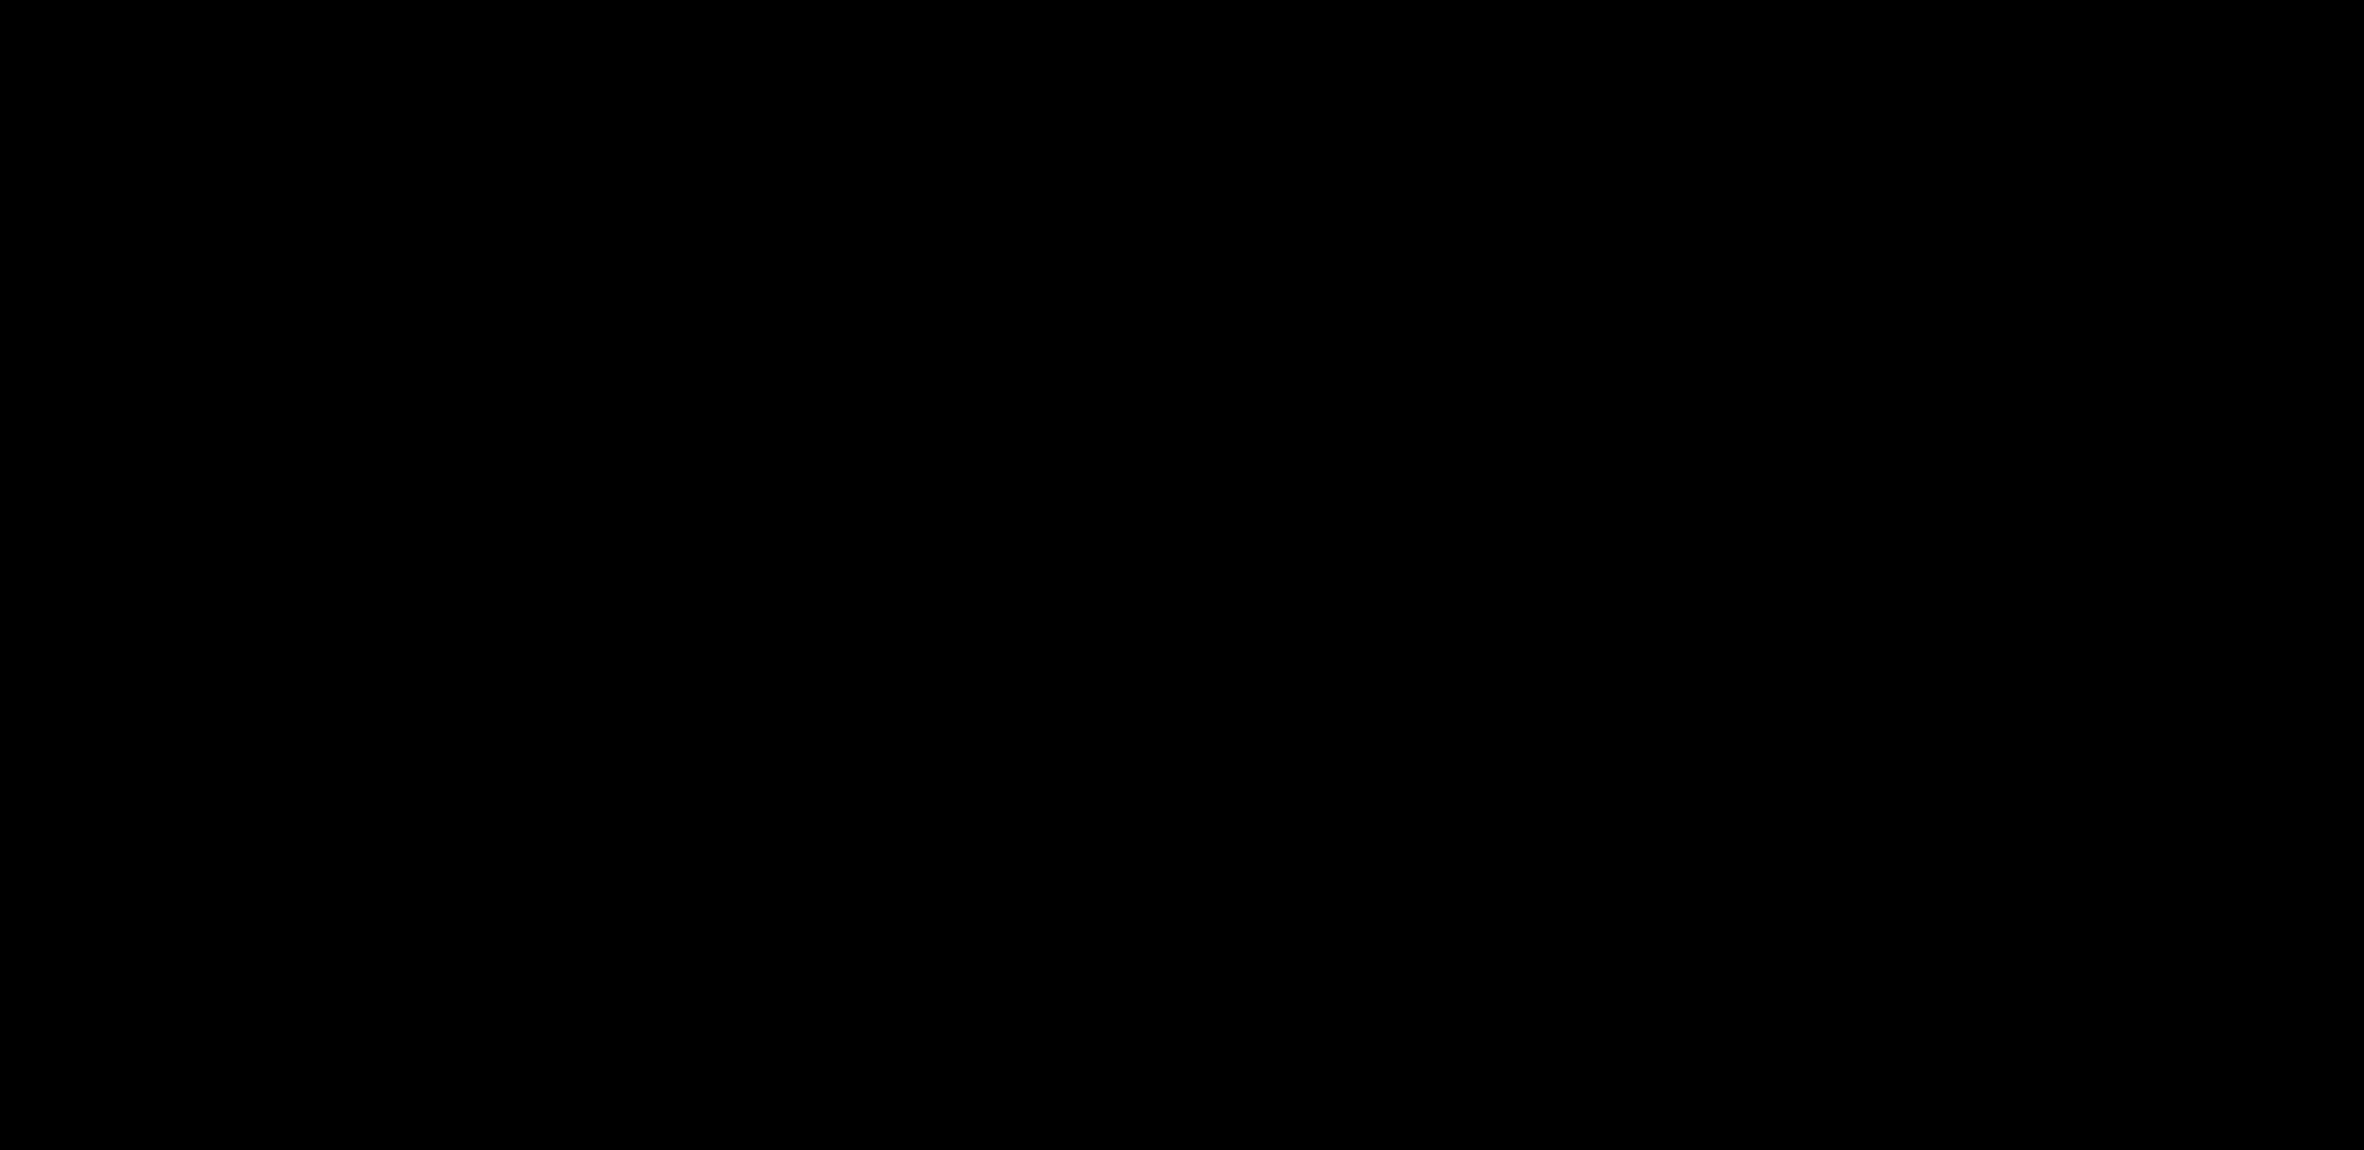 Png image web icons. Bat clipart transparent background